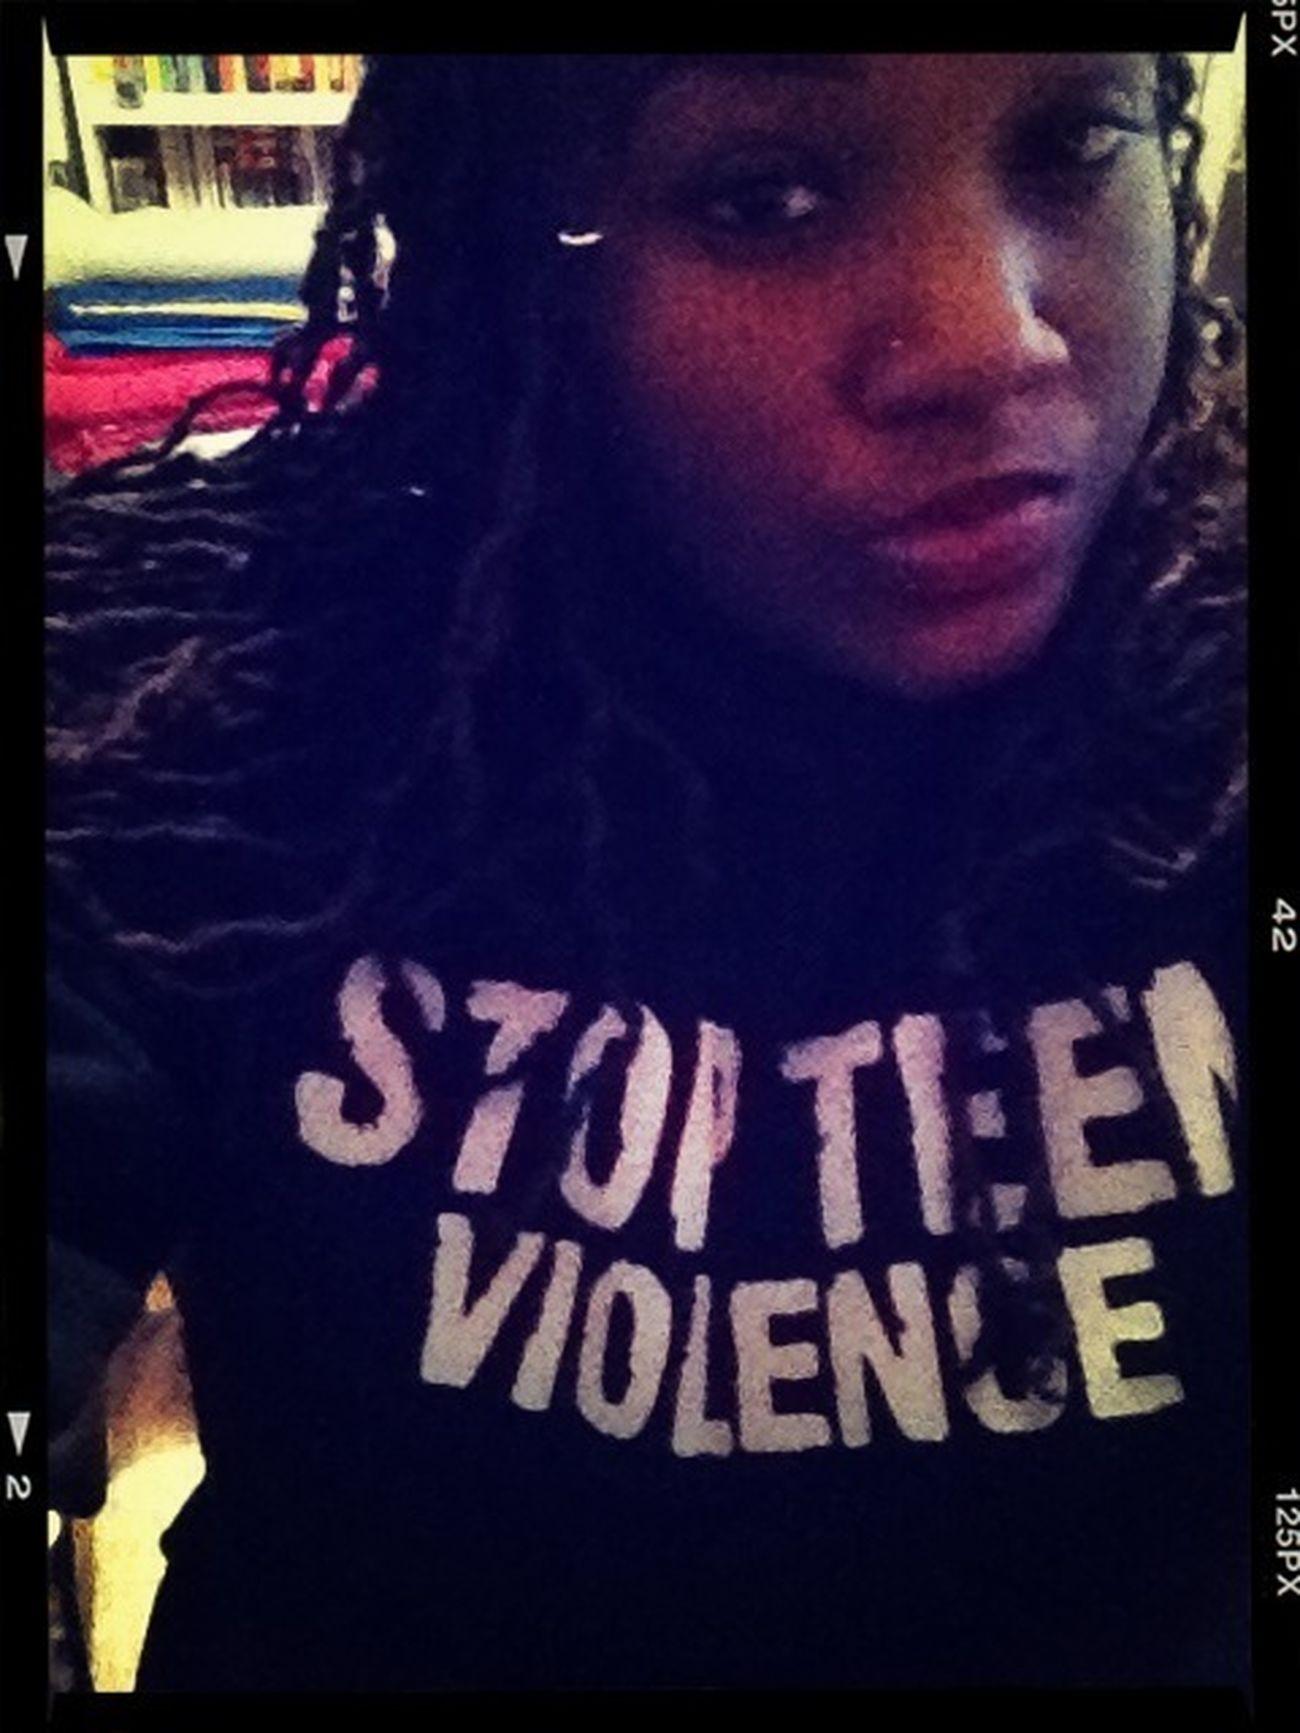 Stop Teen Violence